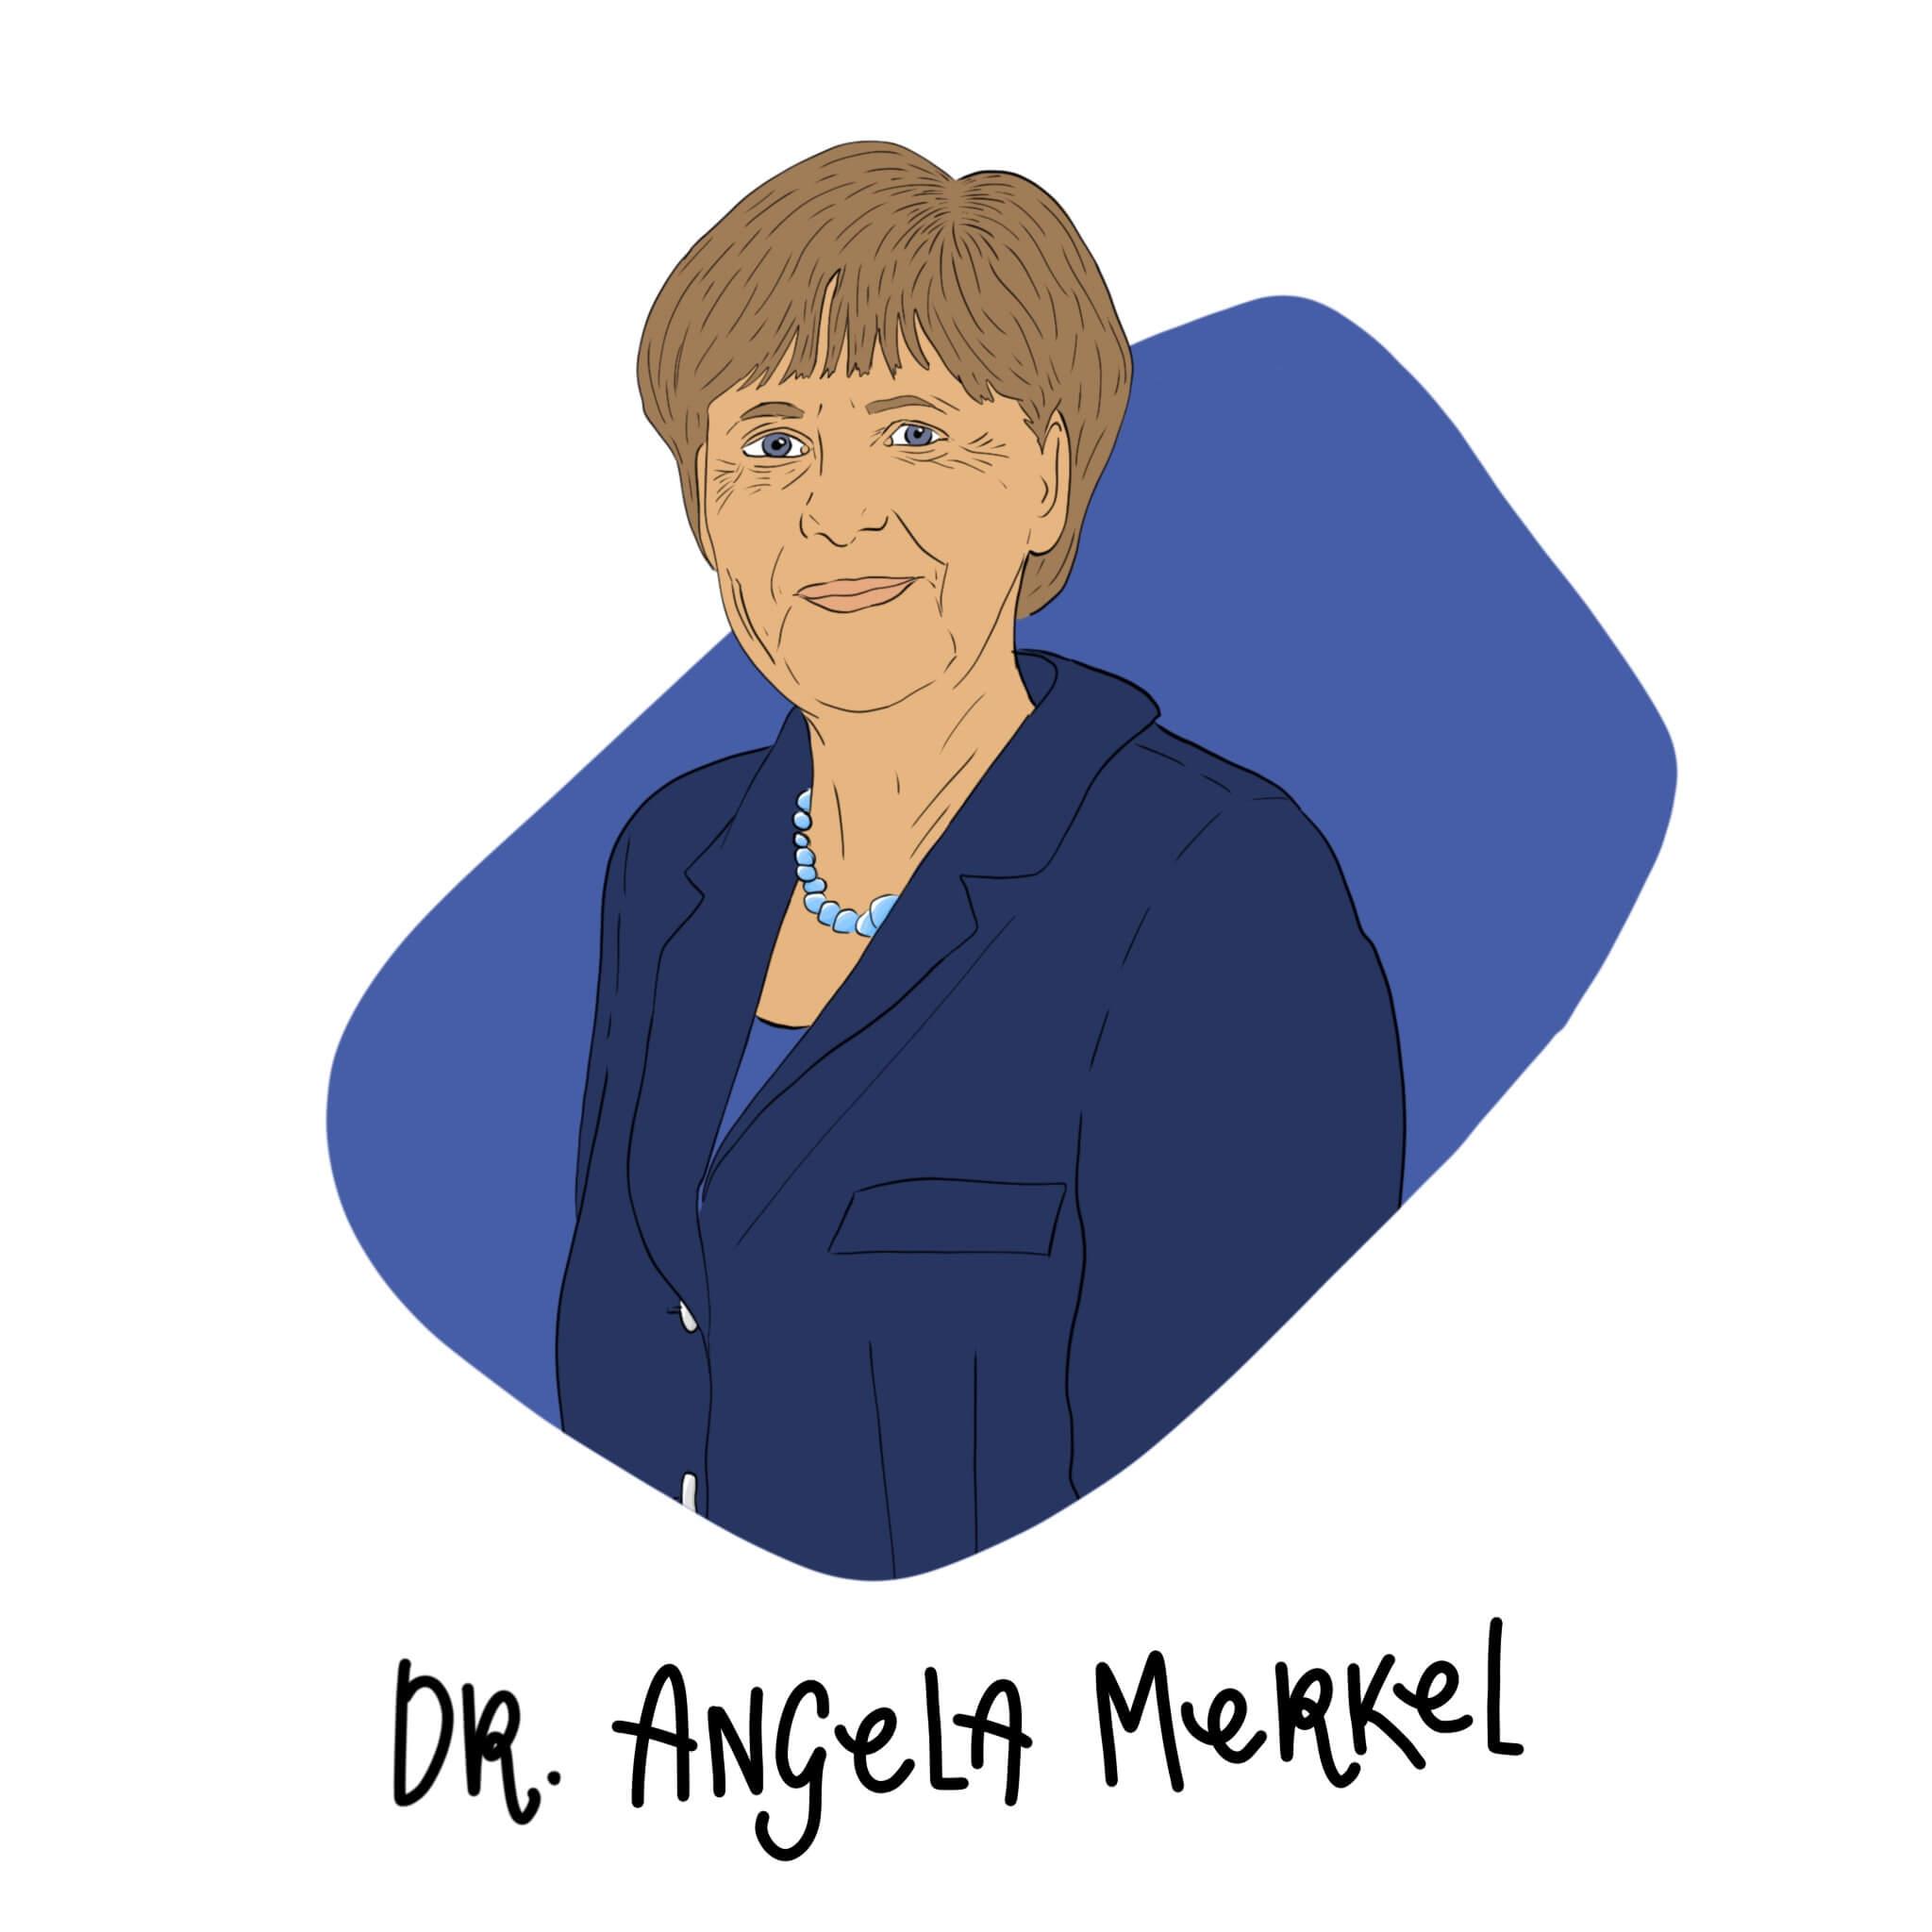 Dr. Angela Merkel Illustration by Jessica Ringelstein